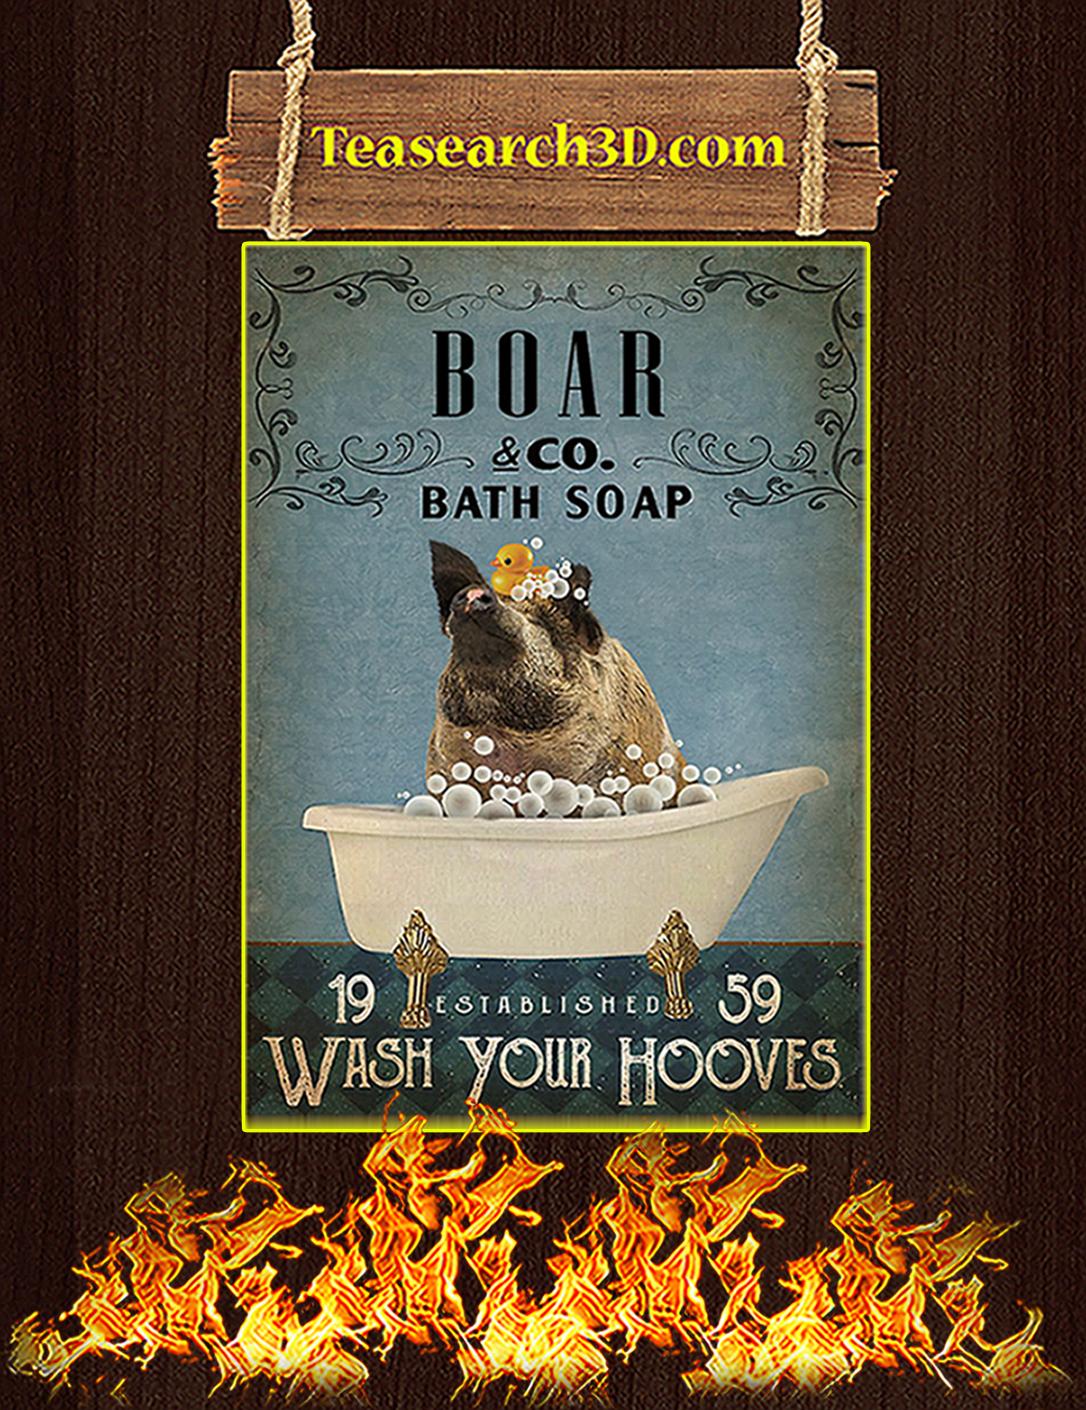 Vintage Bath Soap Boar Poster A2